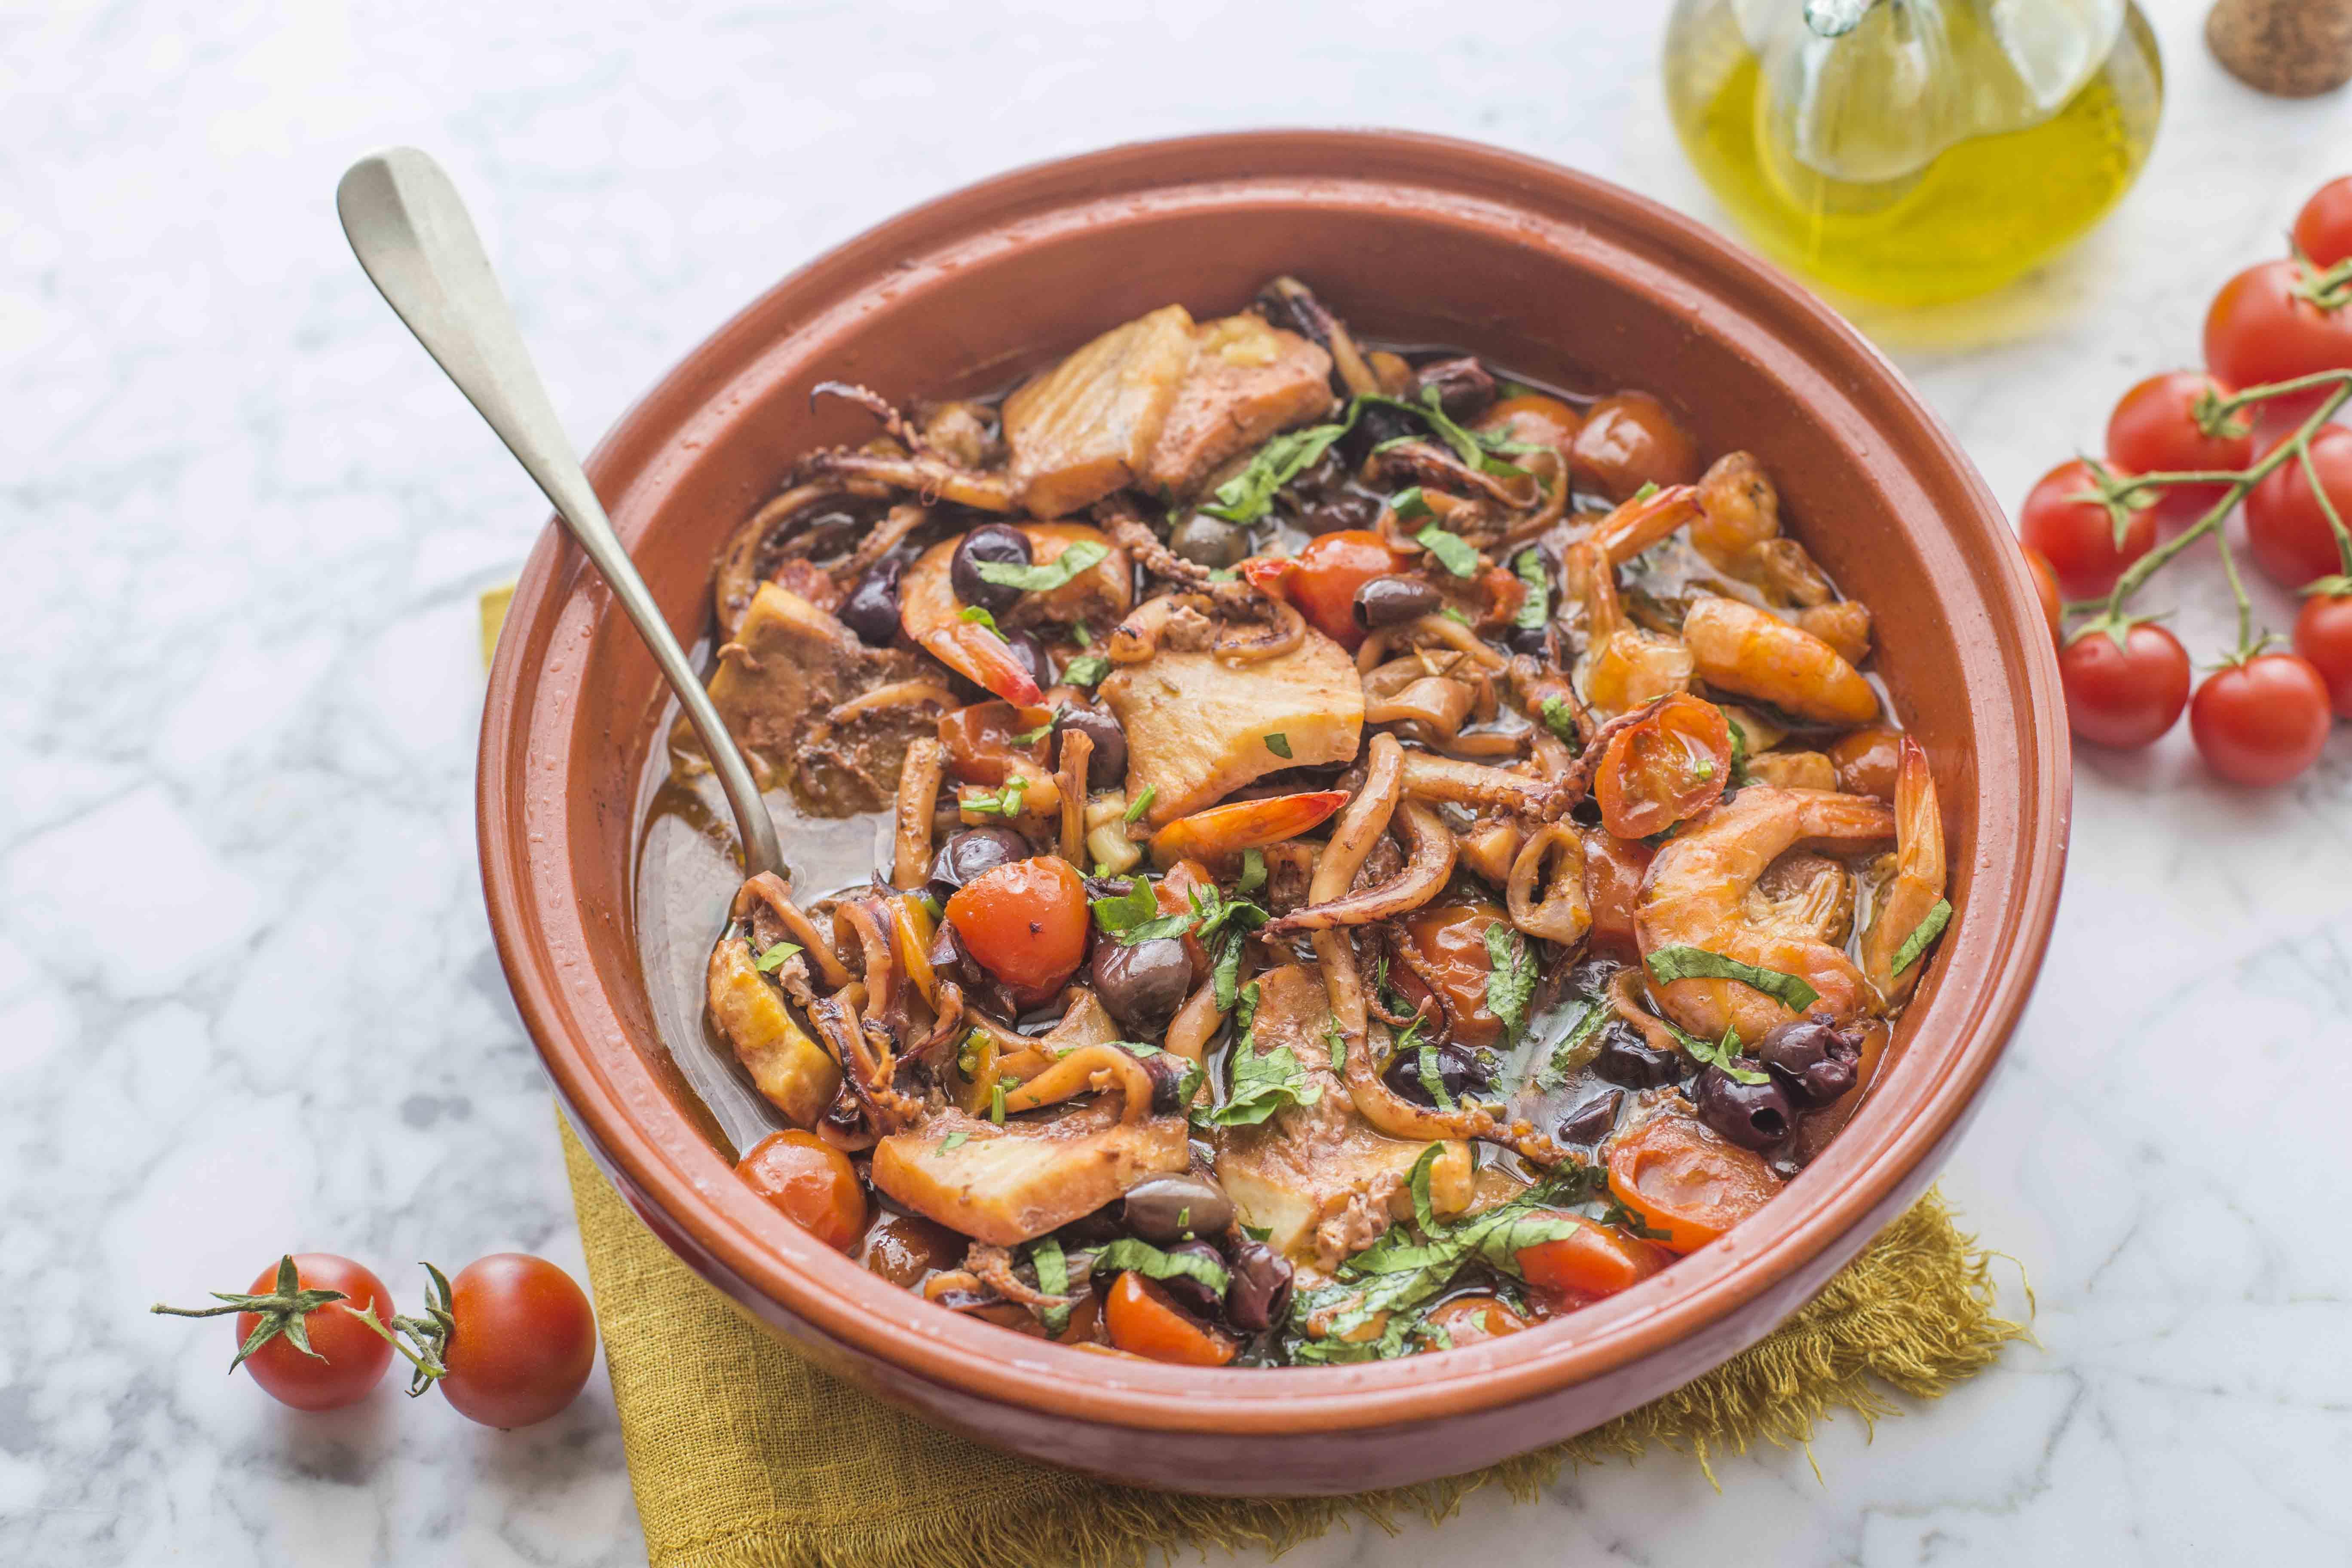 Ricetta Tajine Di Pesce Sapore Berbero Agrodolce